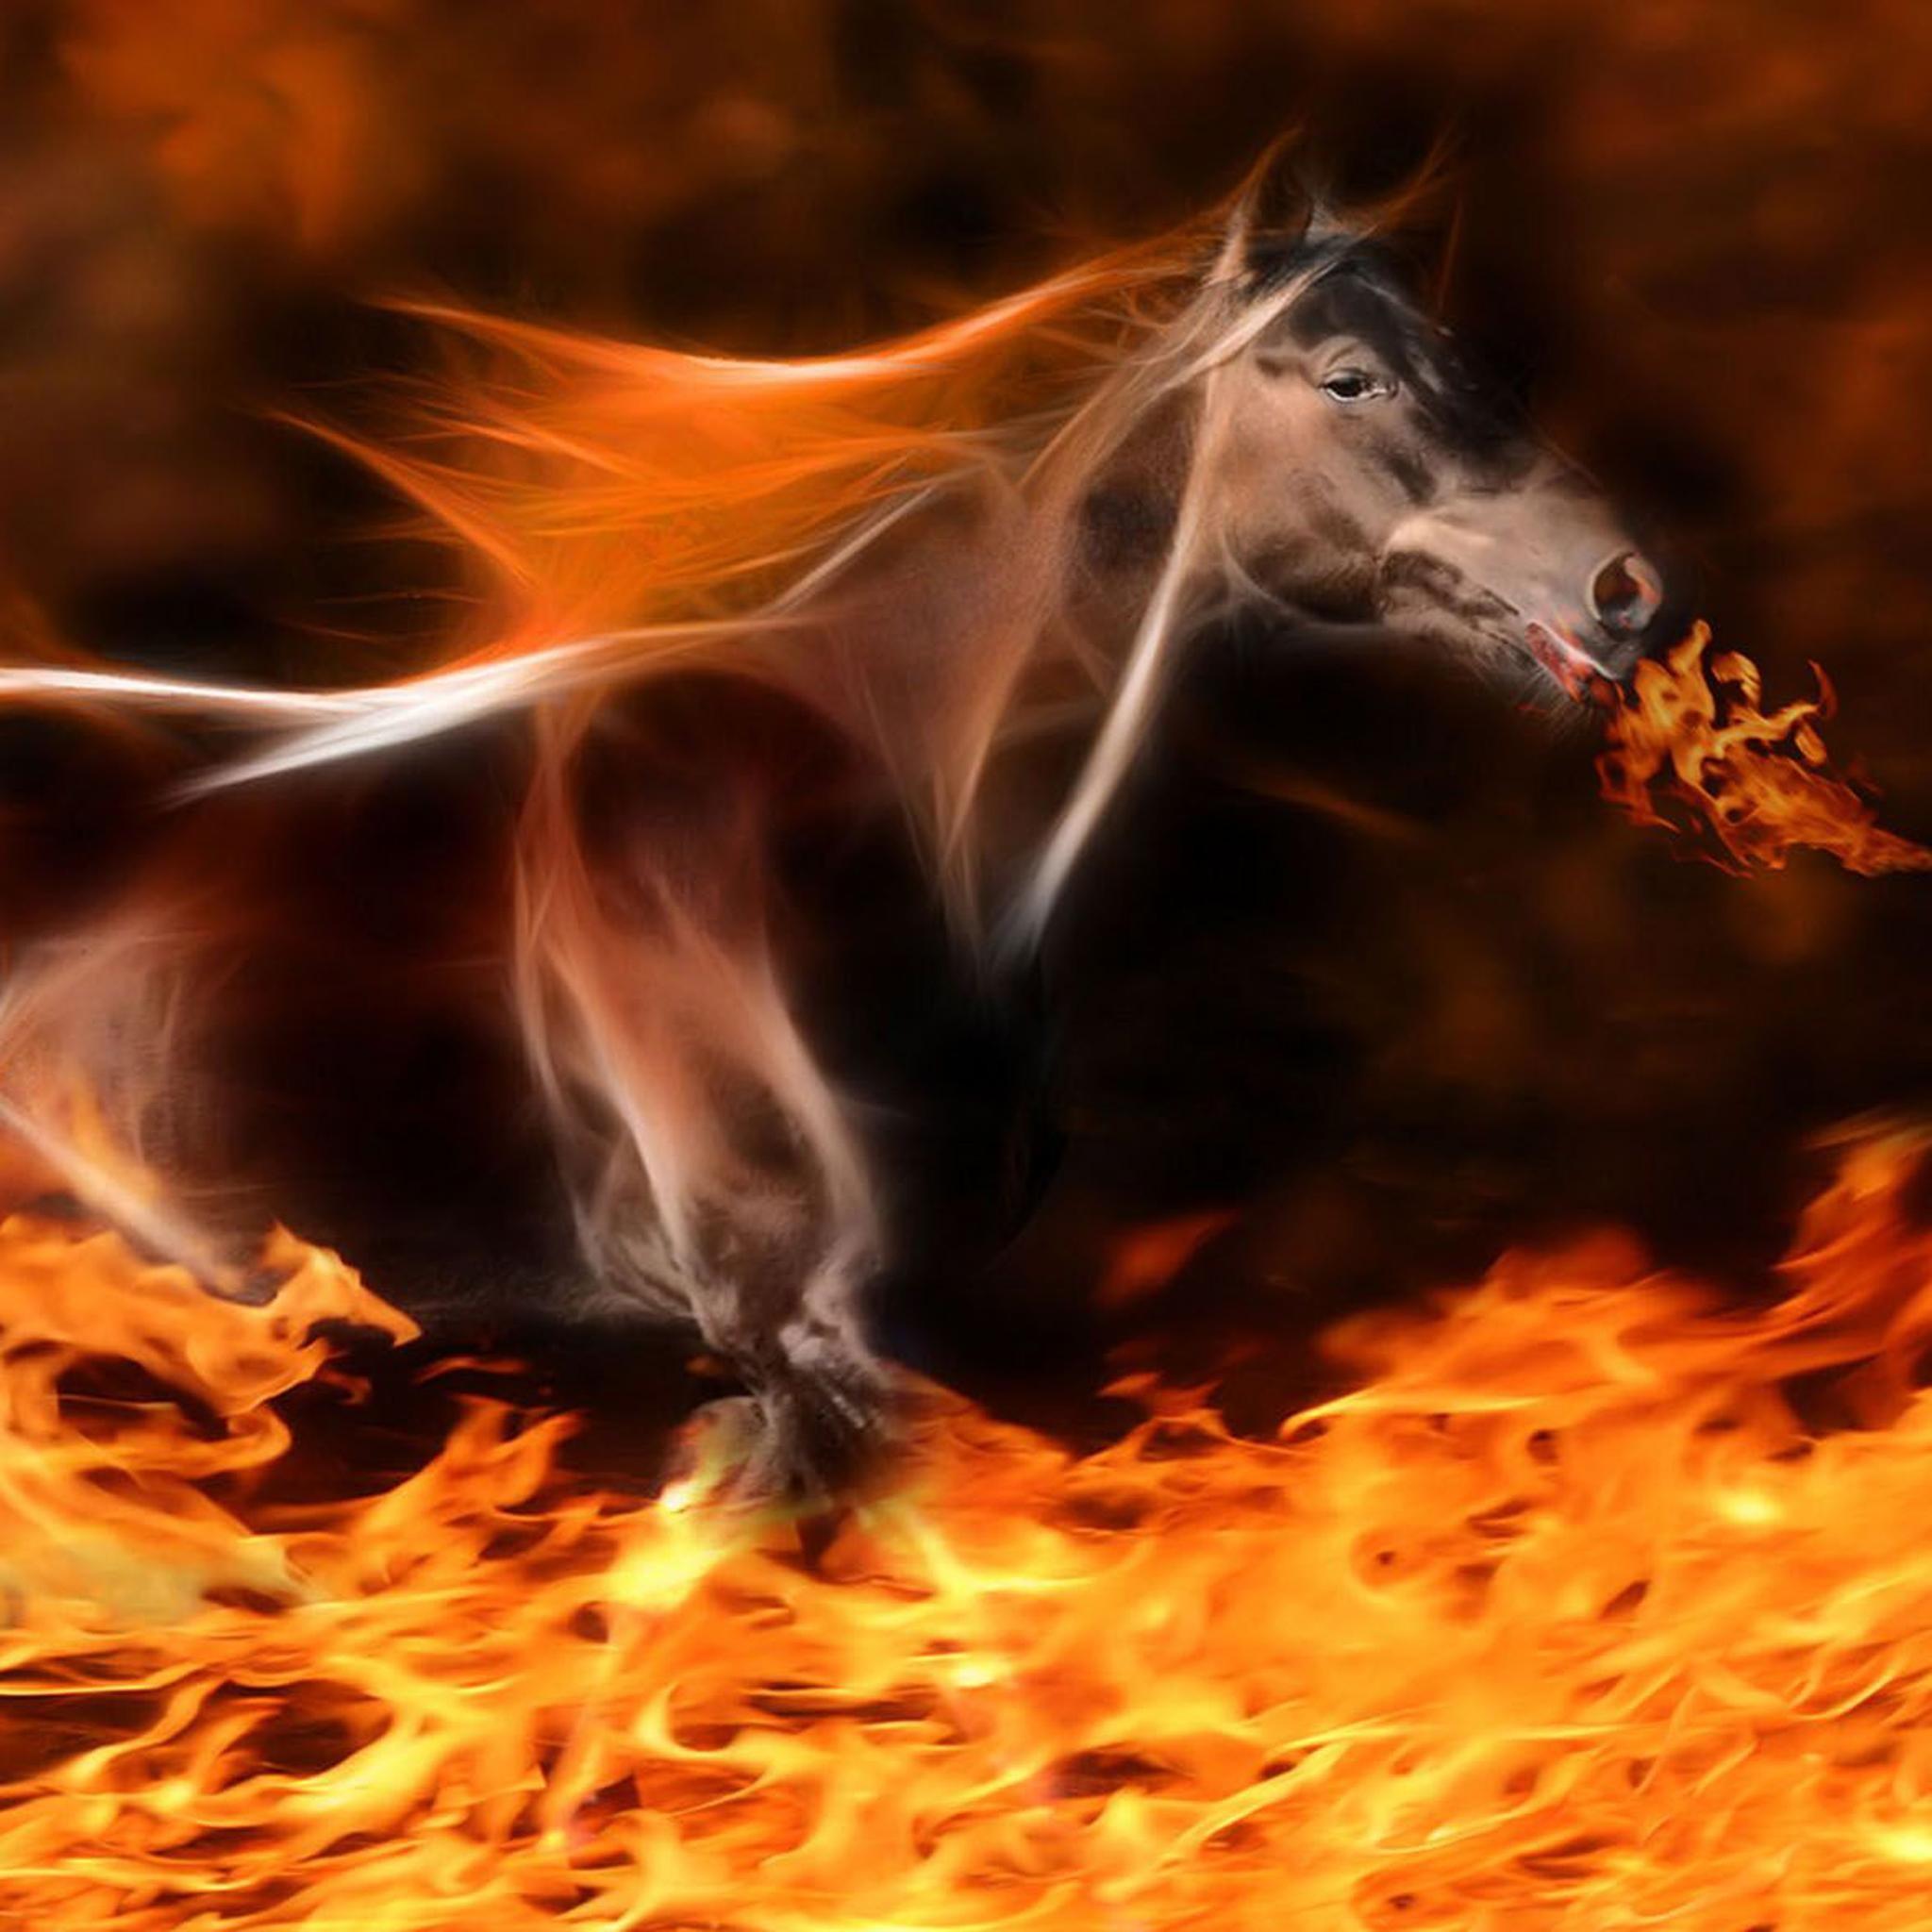 Fire Horse Wallpaper Hd 61 Images